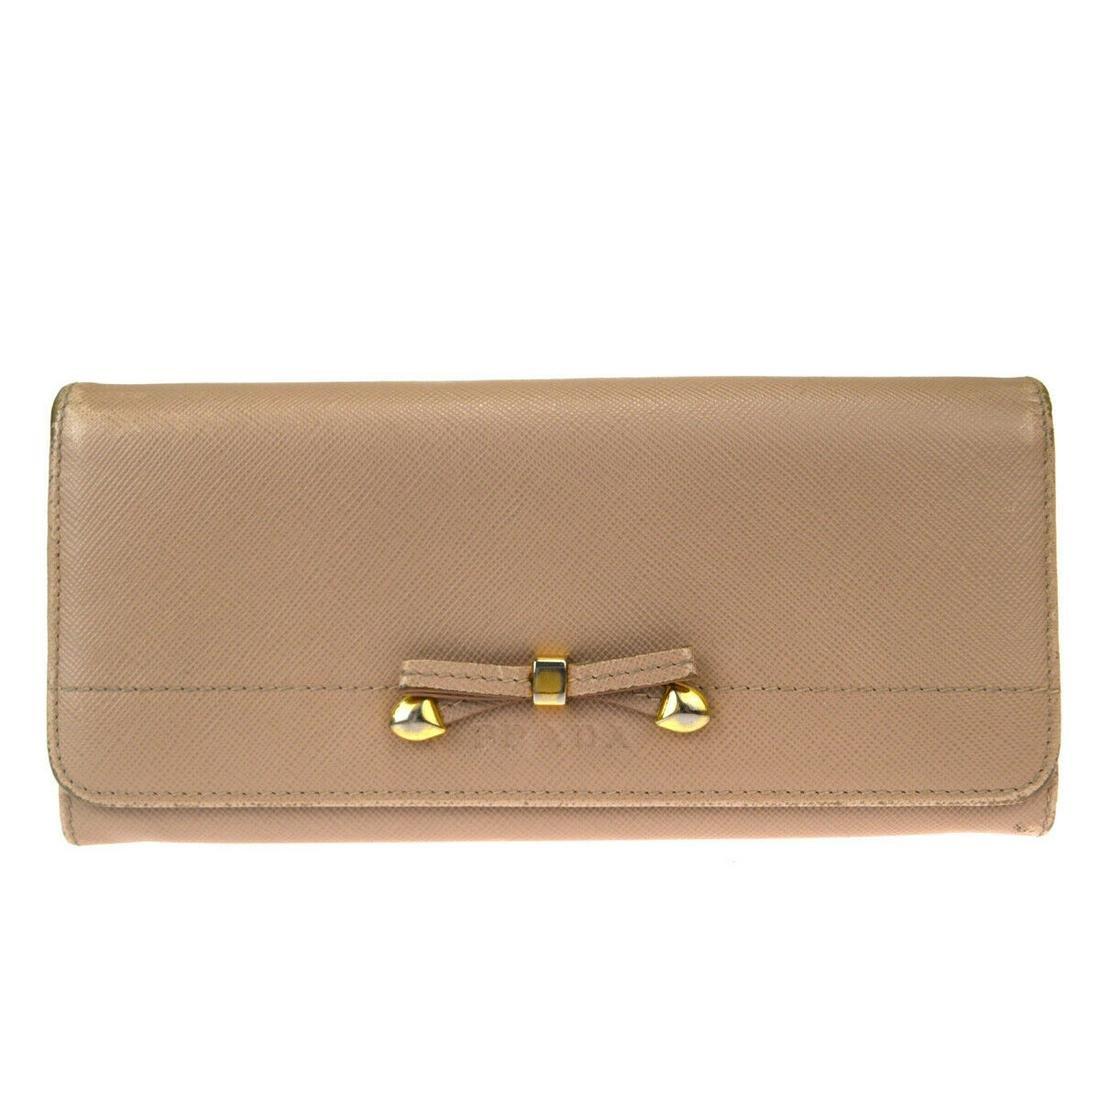 Authentic PRADA Leather Wallet